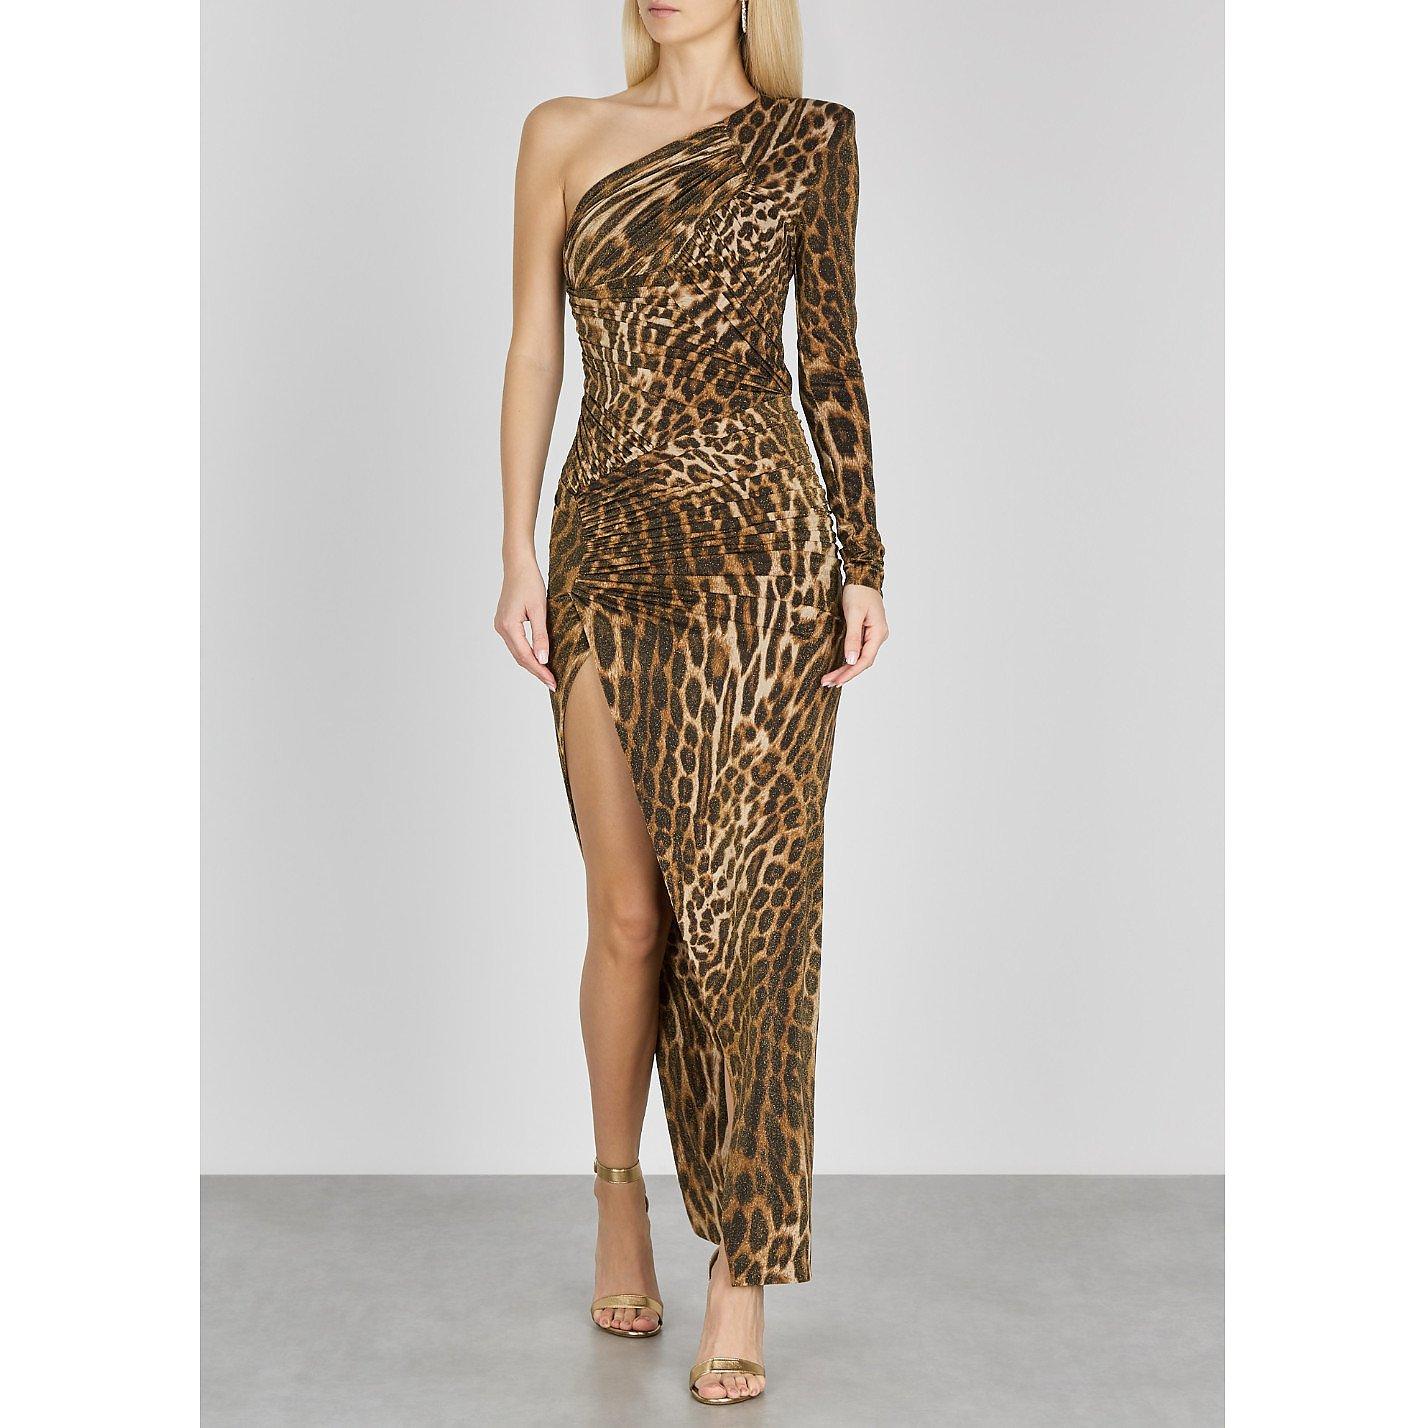 Alexandre Vauthier Leopard-Print One Shoulder Metallic Jersey Gown